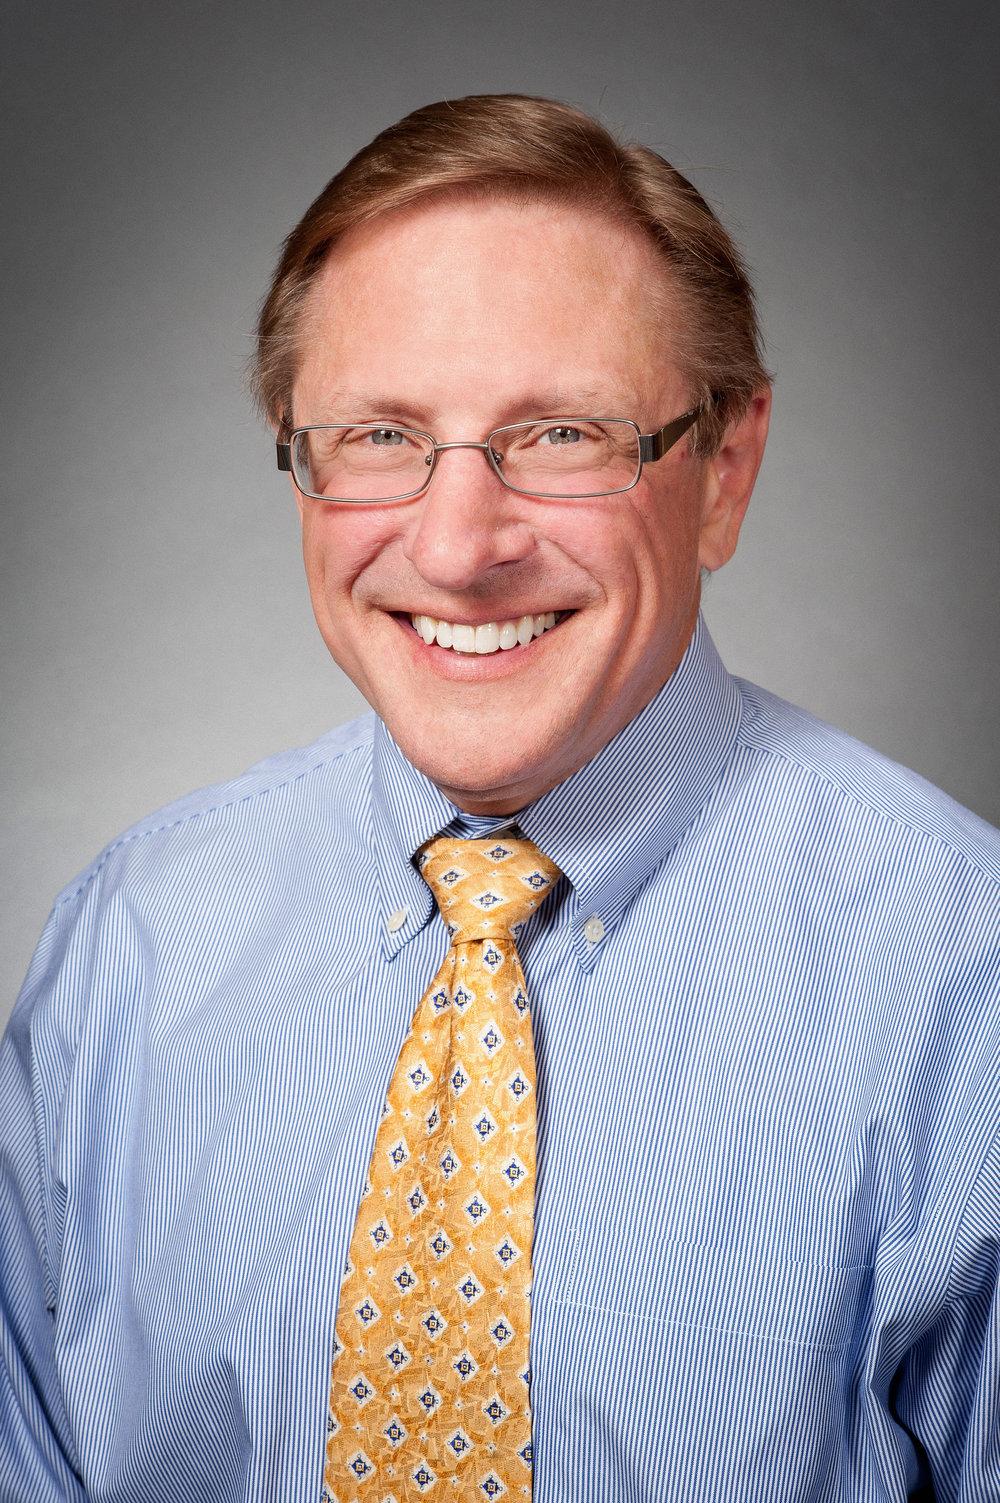 Steve Bierbrunner, CPA - AUdit Partner